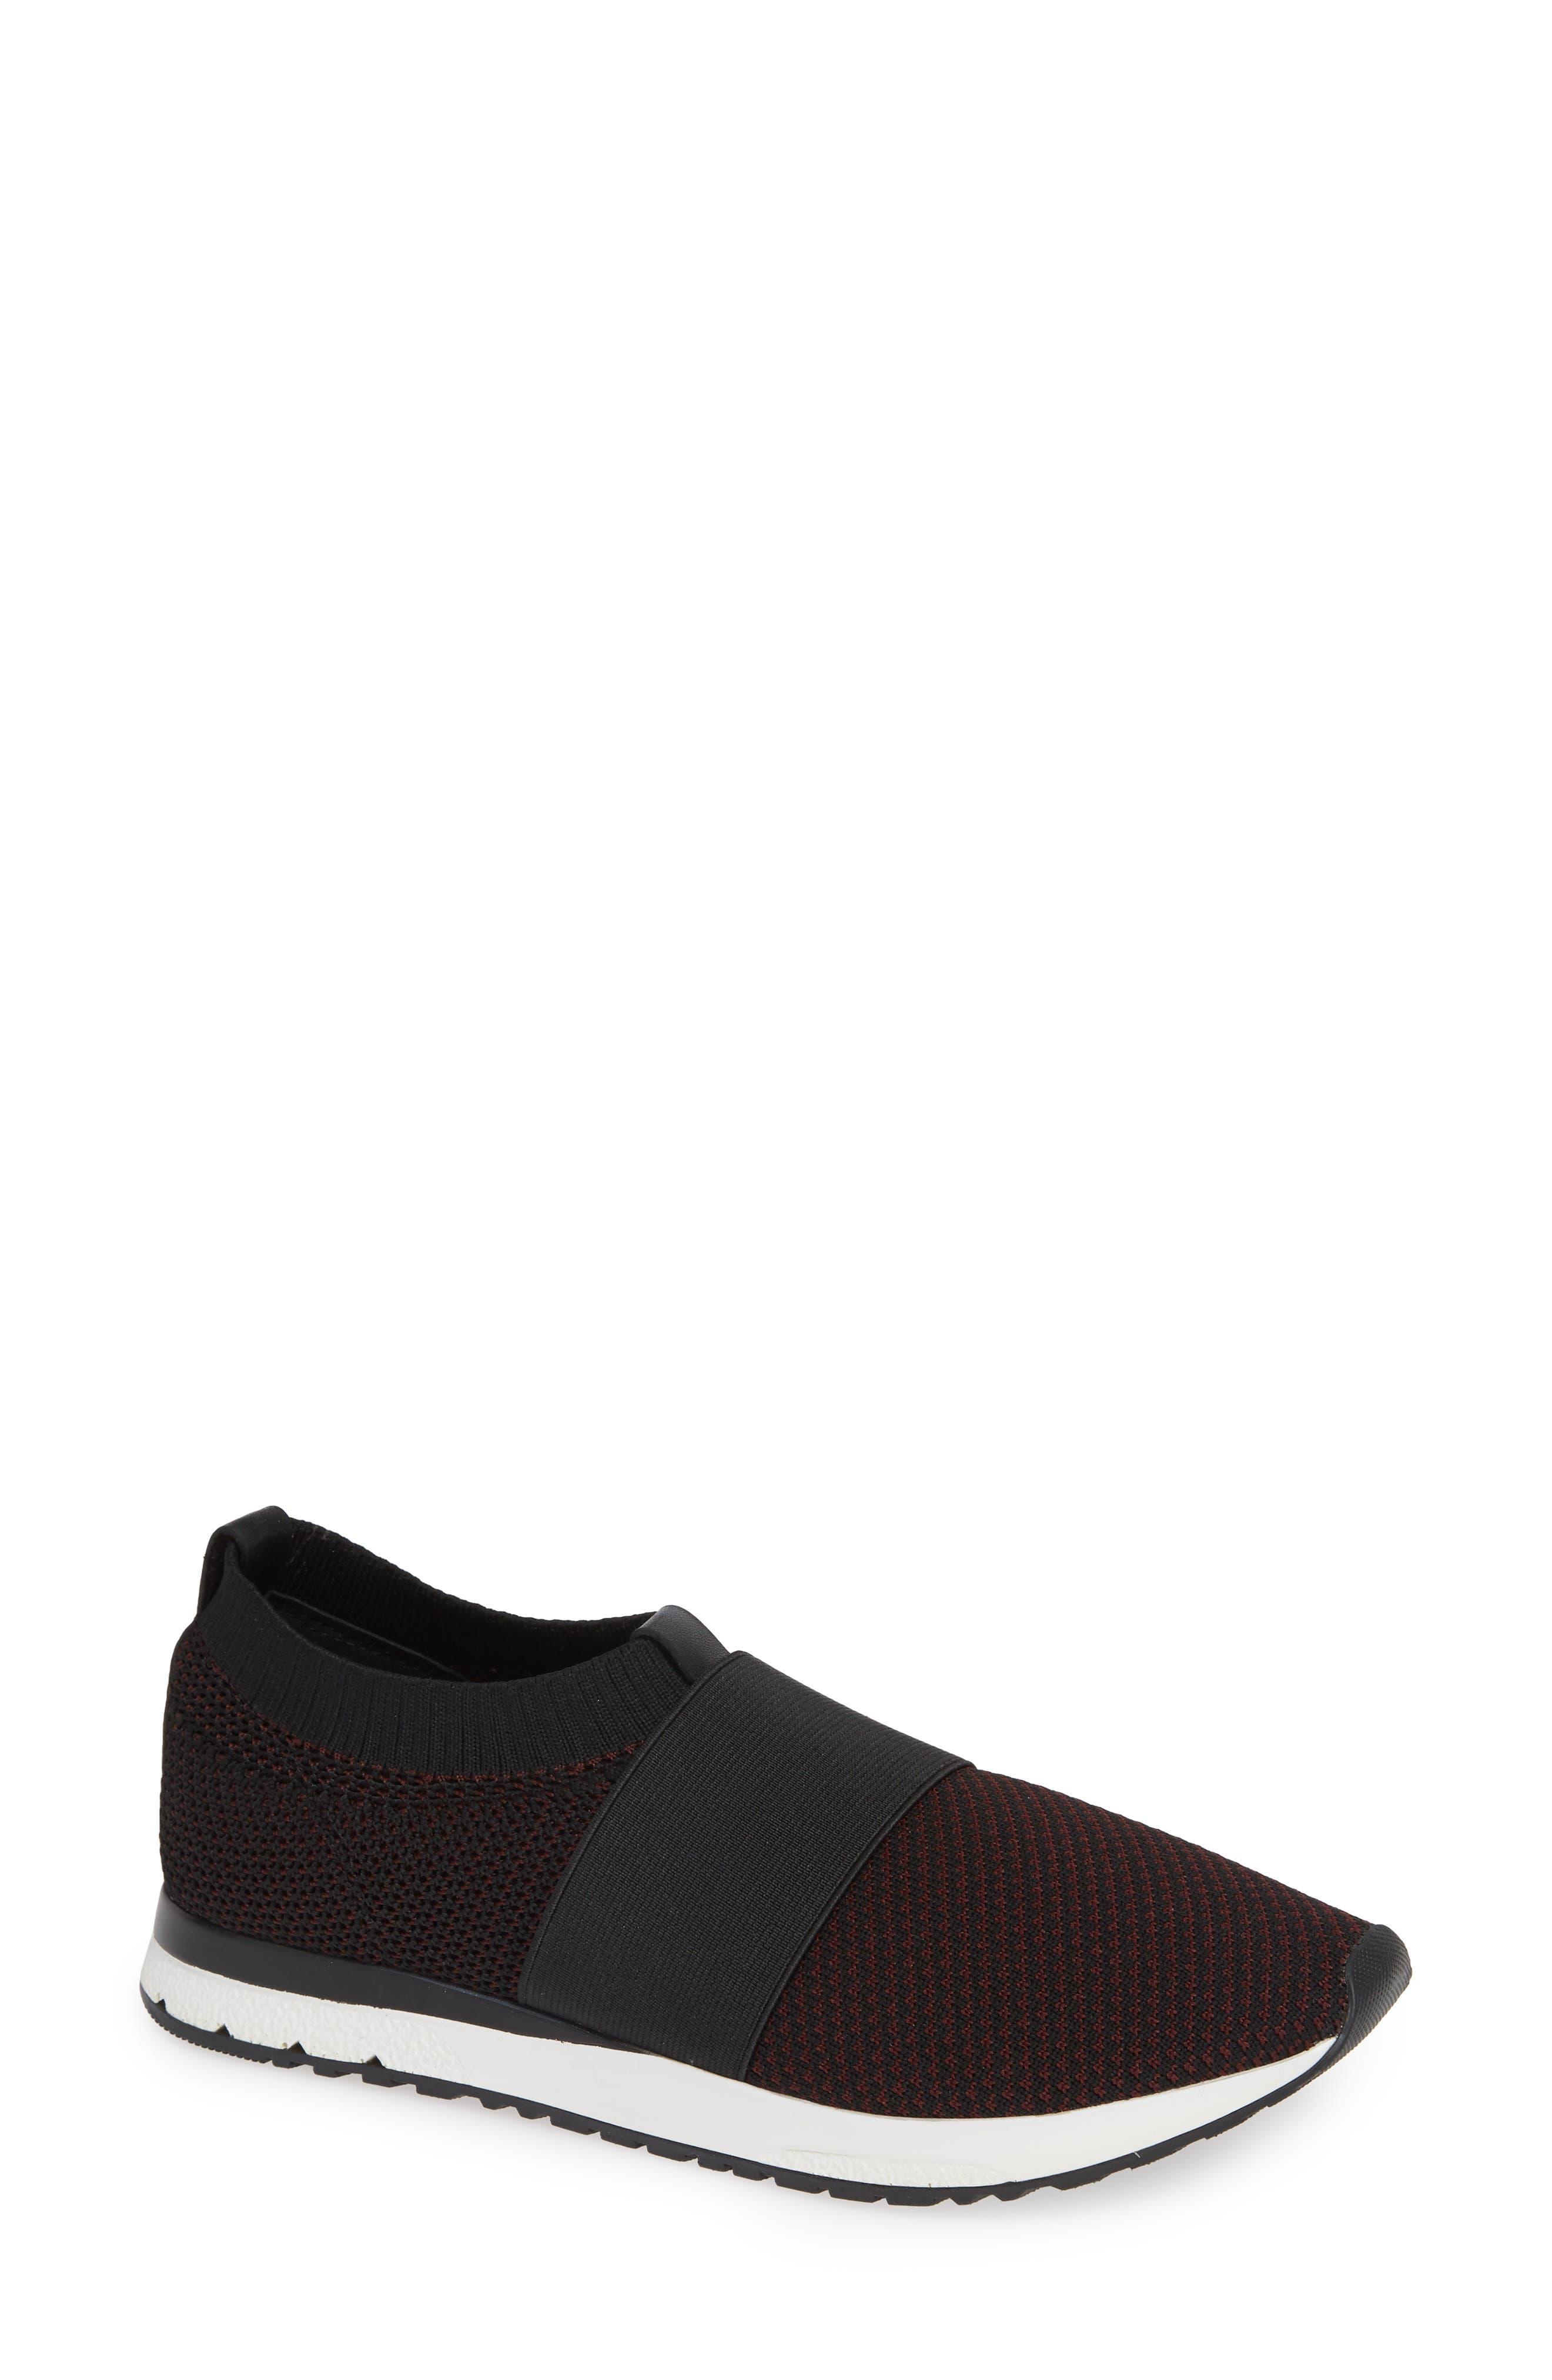 Brooke Slip-On Sneaker, Main, color, BLACK/ WINE KNIT FABRIC